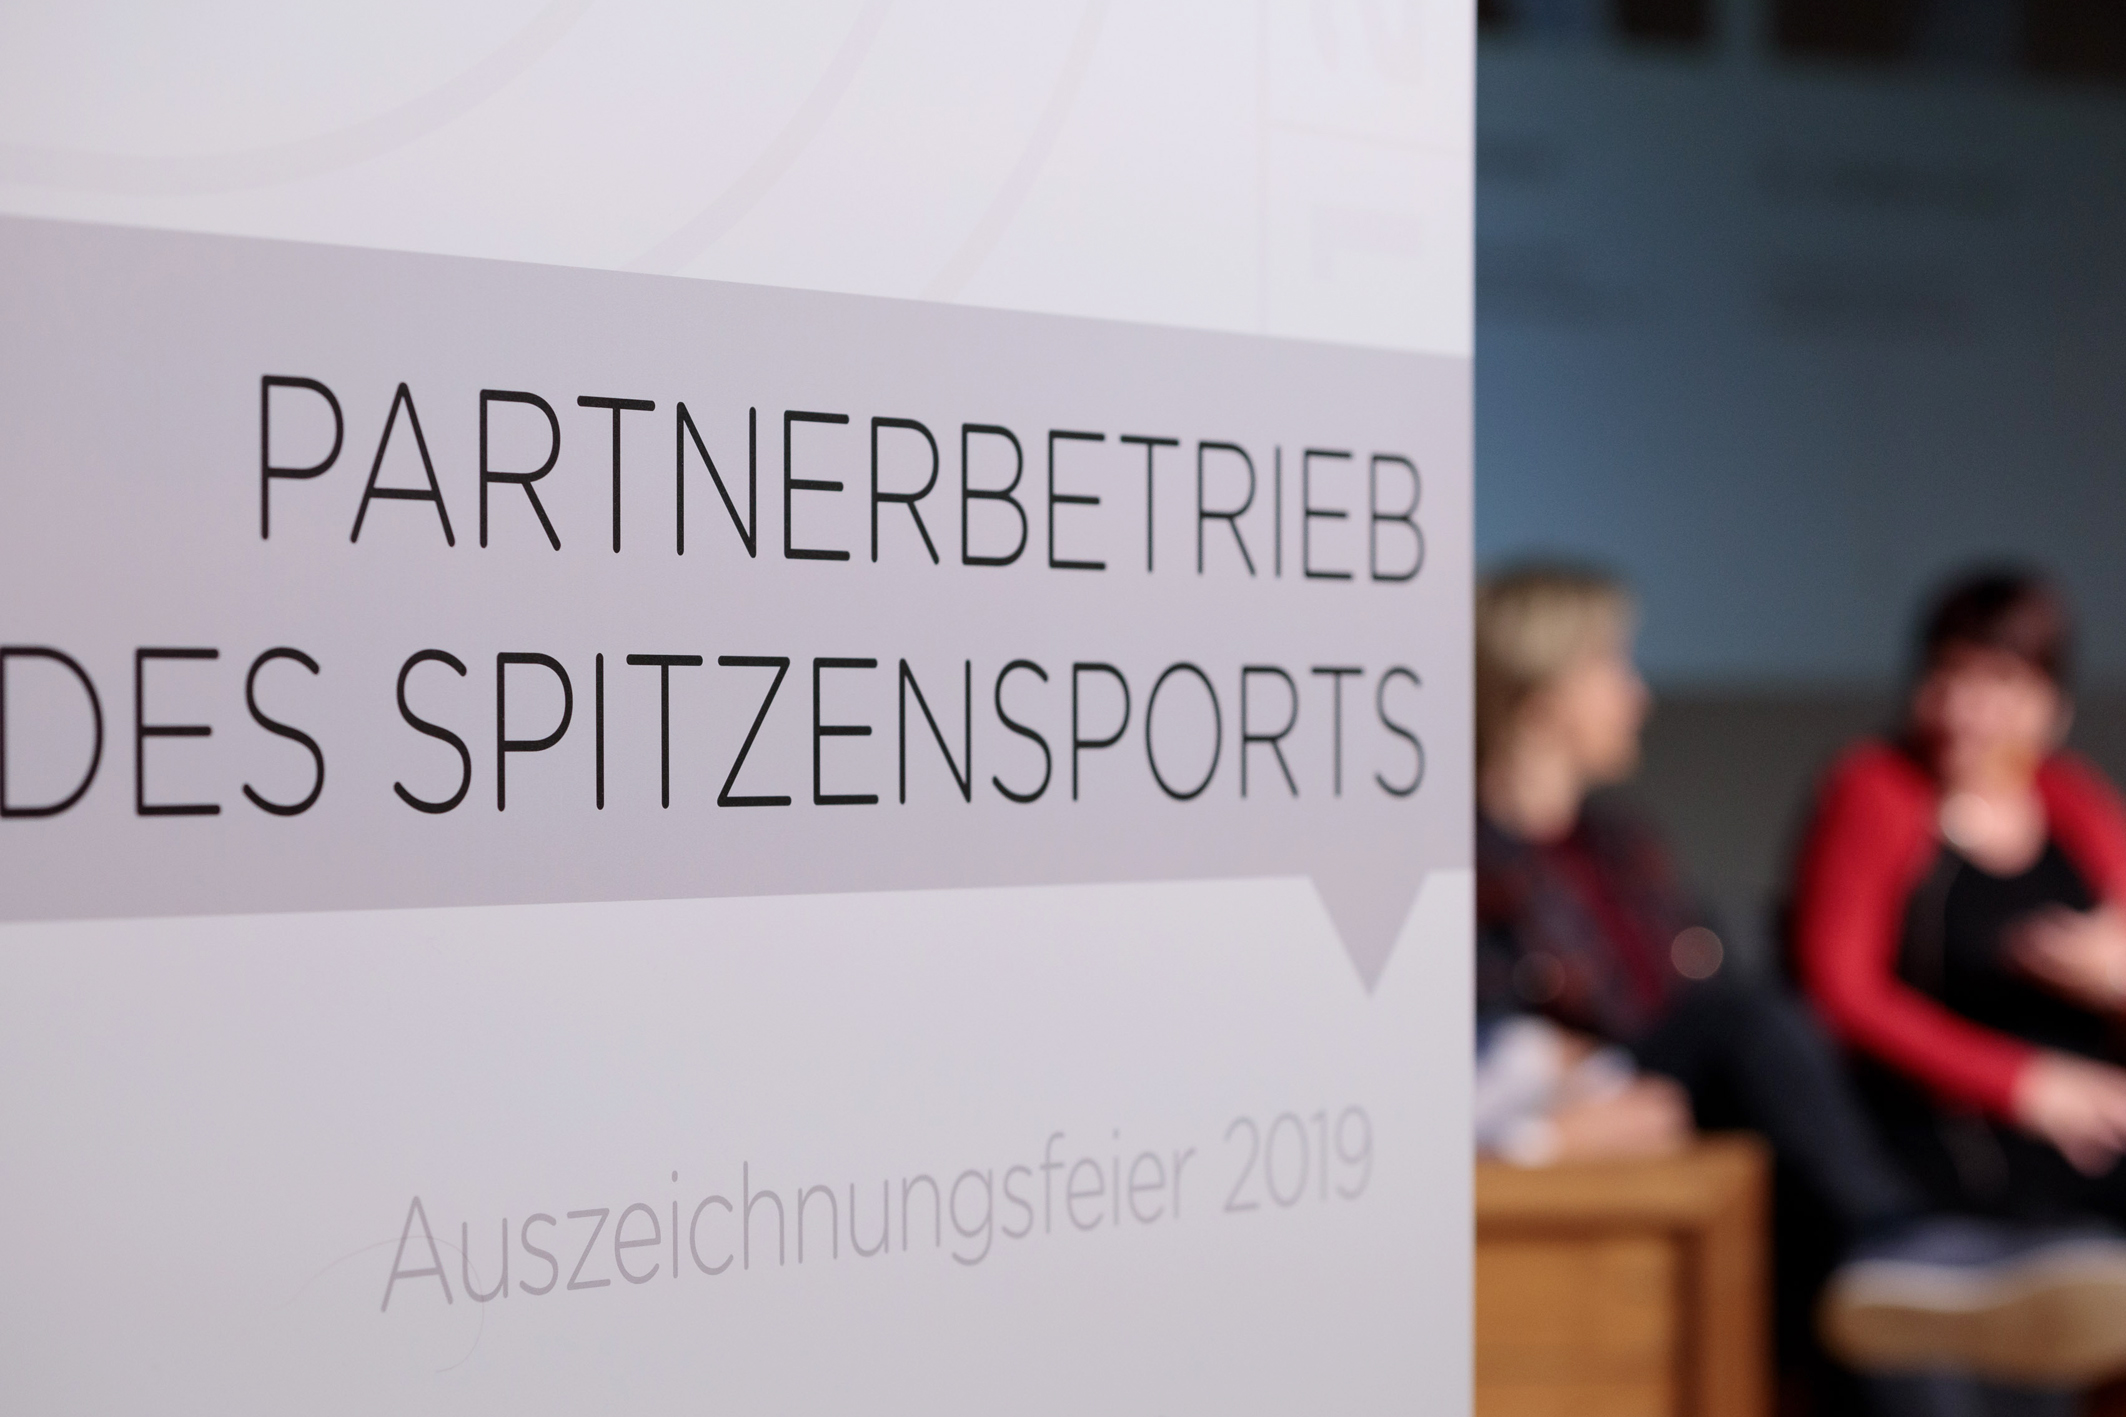 Partnerbetrieb des Spitzensports 2019